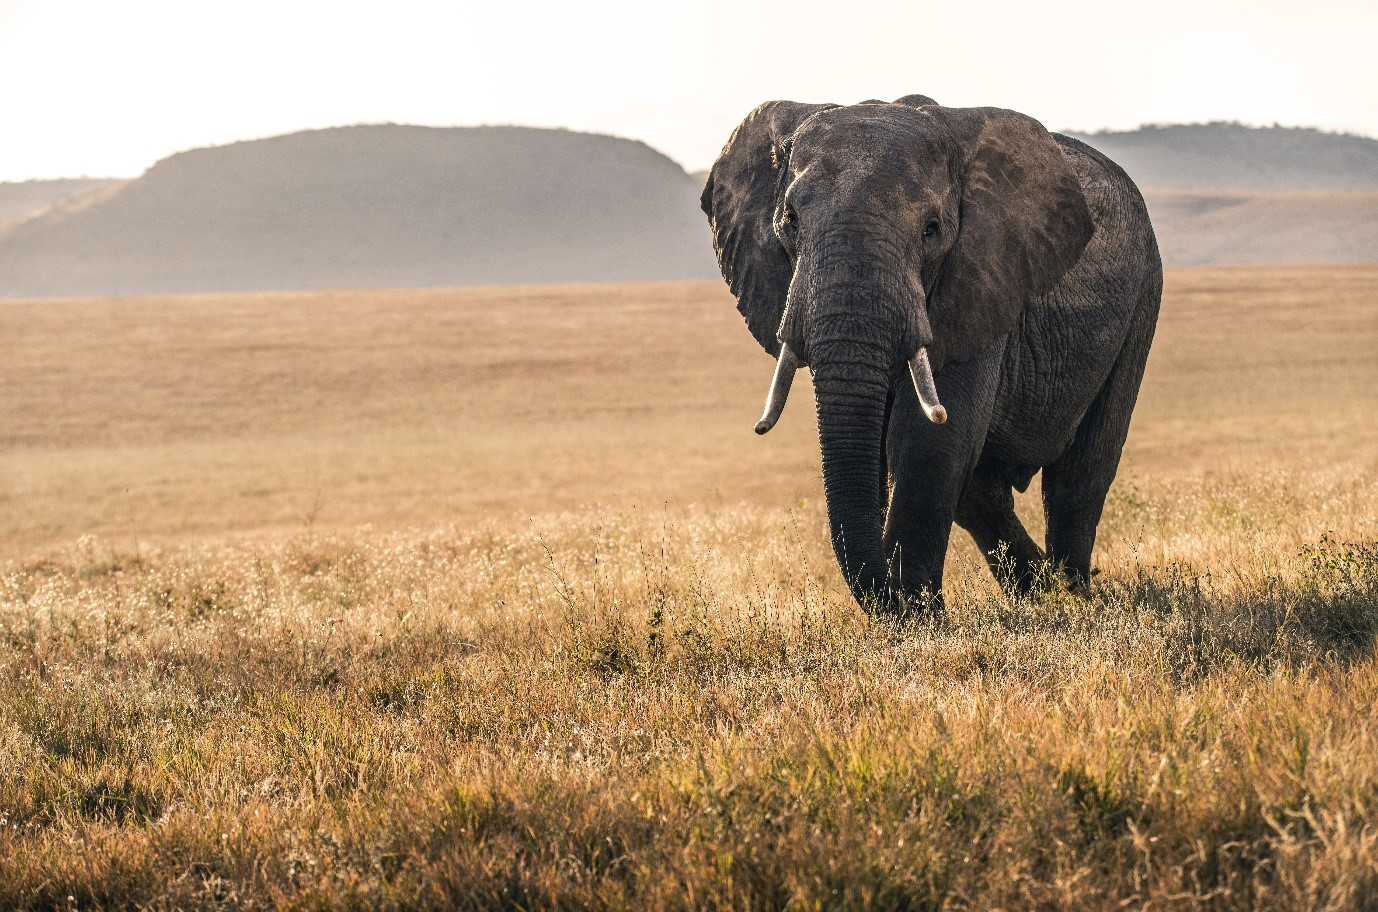 Lewa Wildlife Conservancy, Kenya. Photo by David Clode on Unsplash